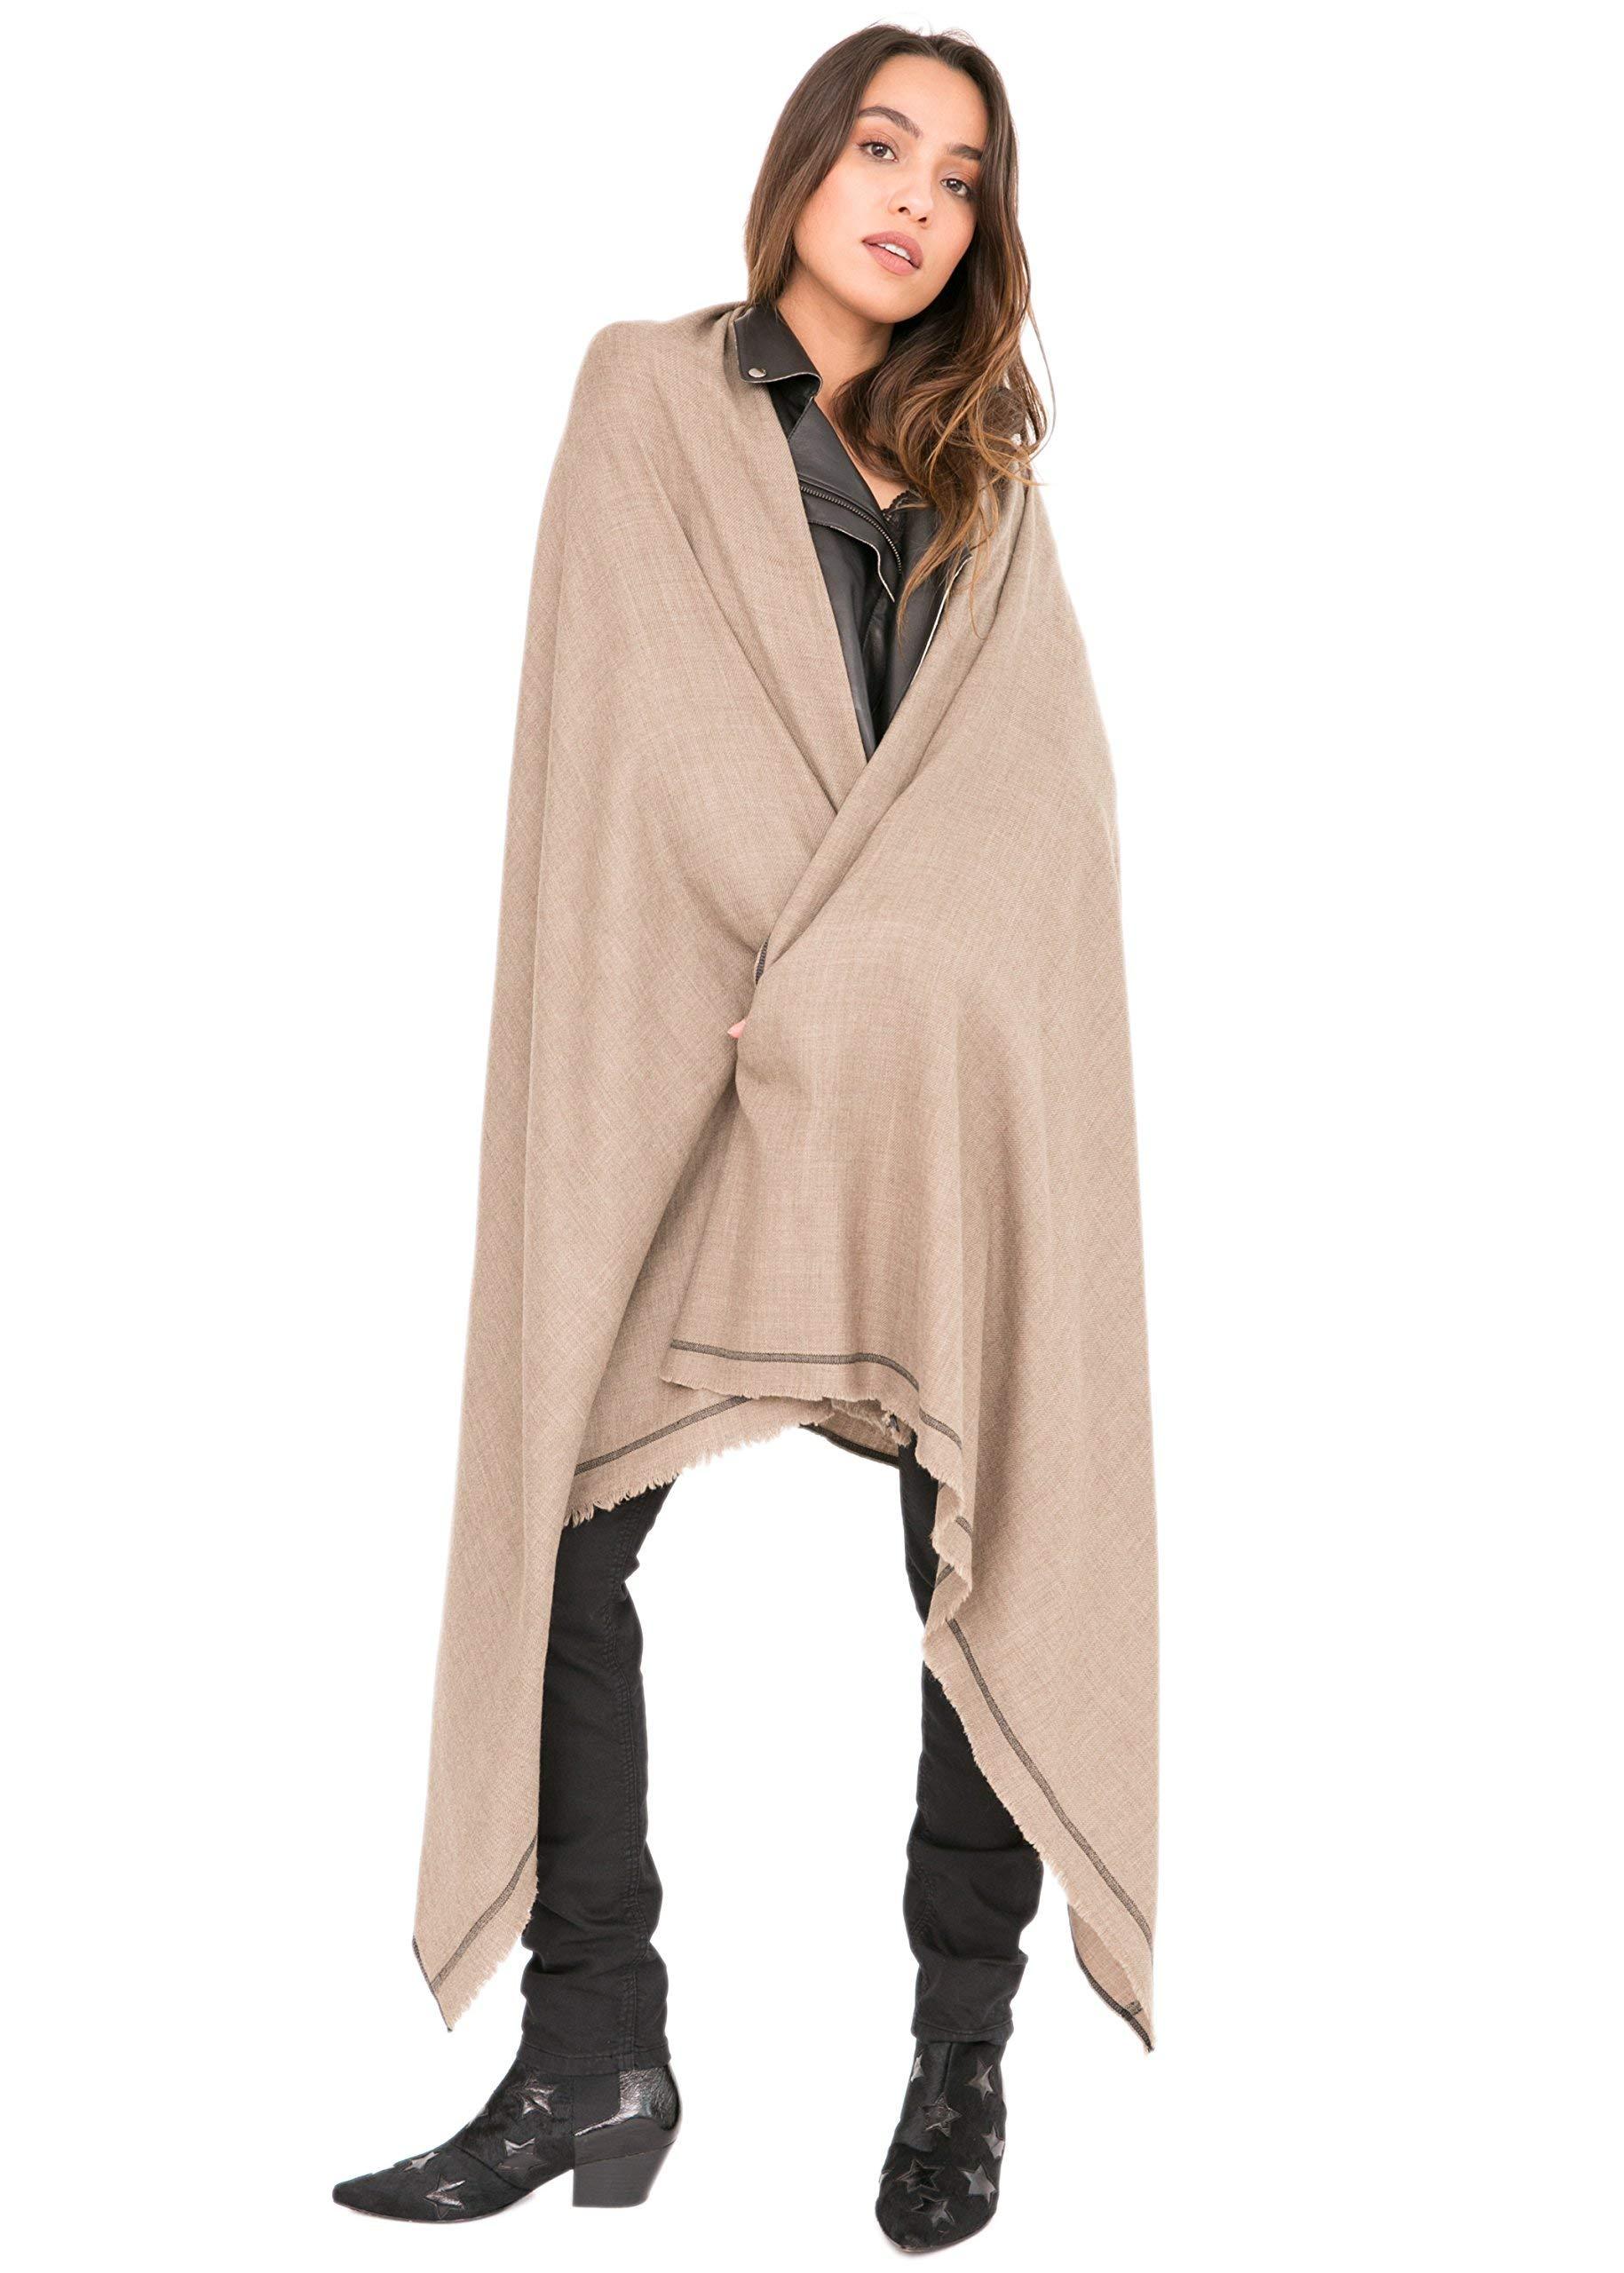 likemary Merino Wool Wrap Shawl & Blanket Scarf Oversize Fairtrade Pashmina Shoreditch Truffle 100 x 215cm